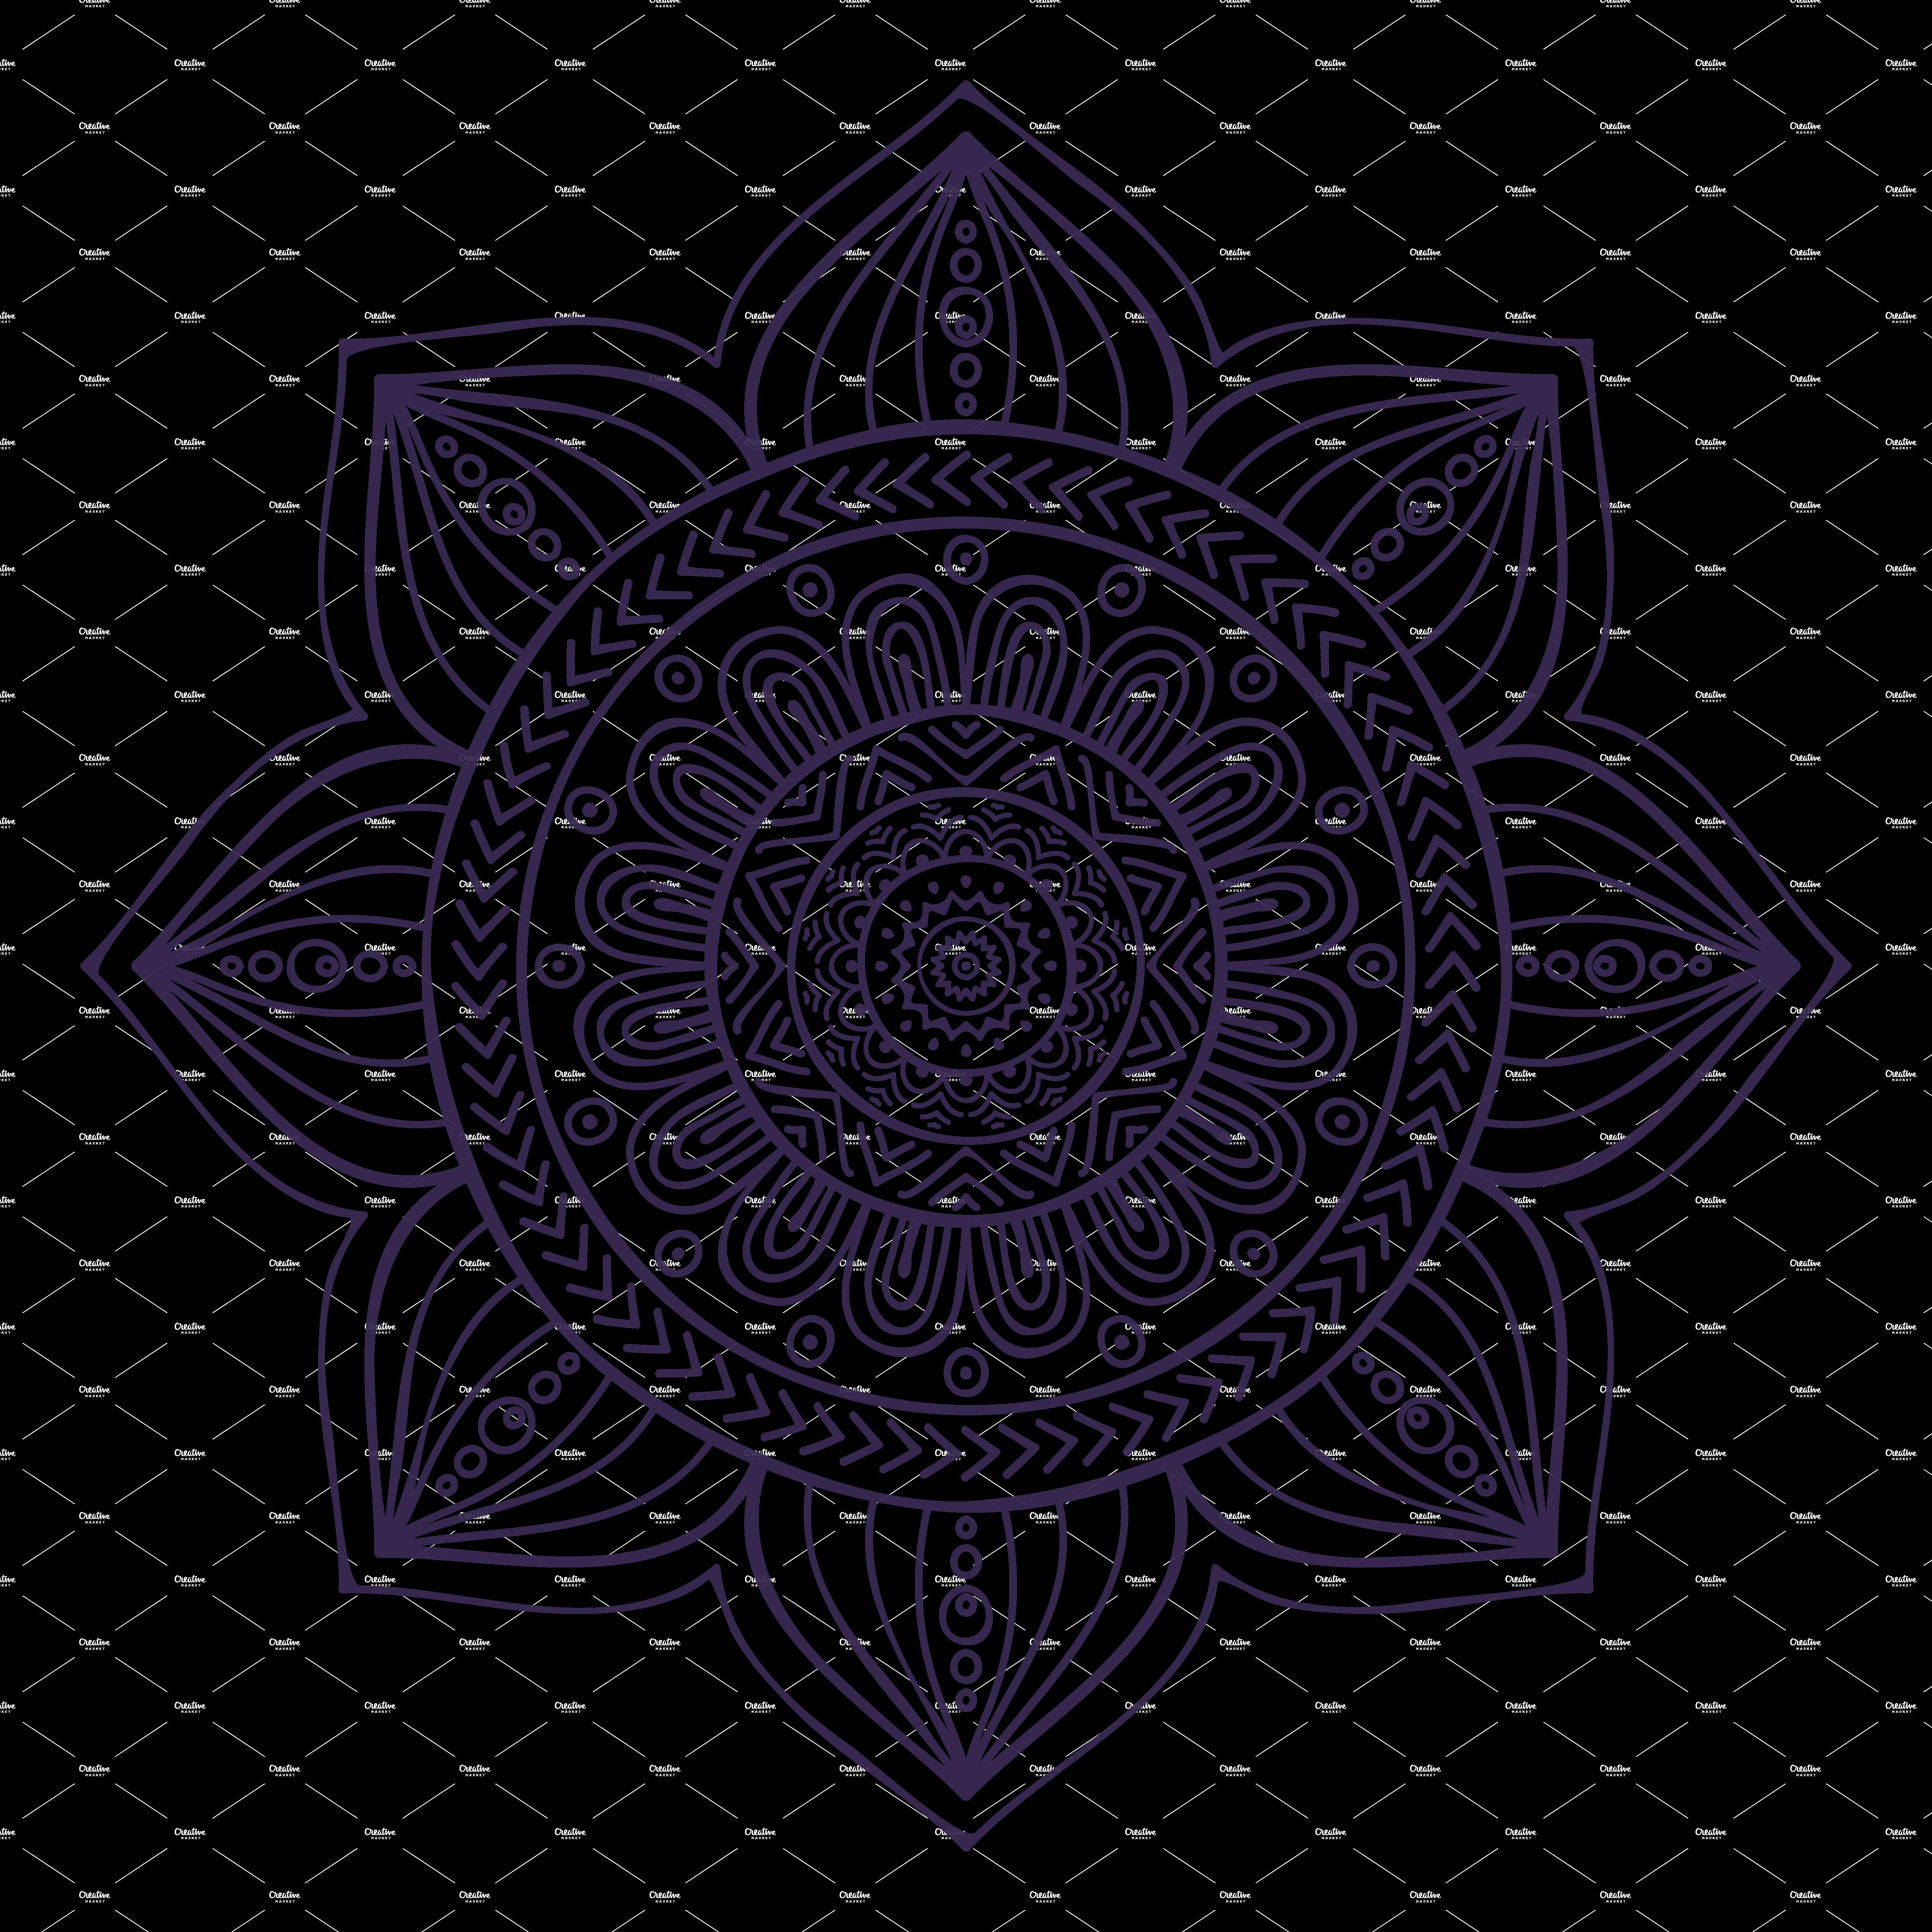 clipart Mandala Collection